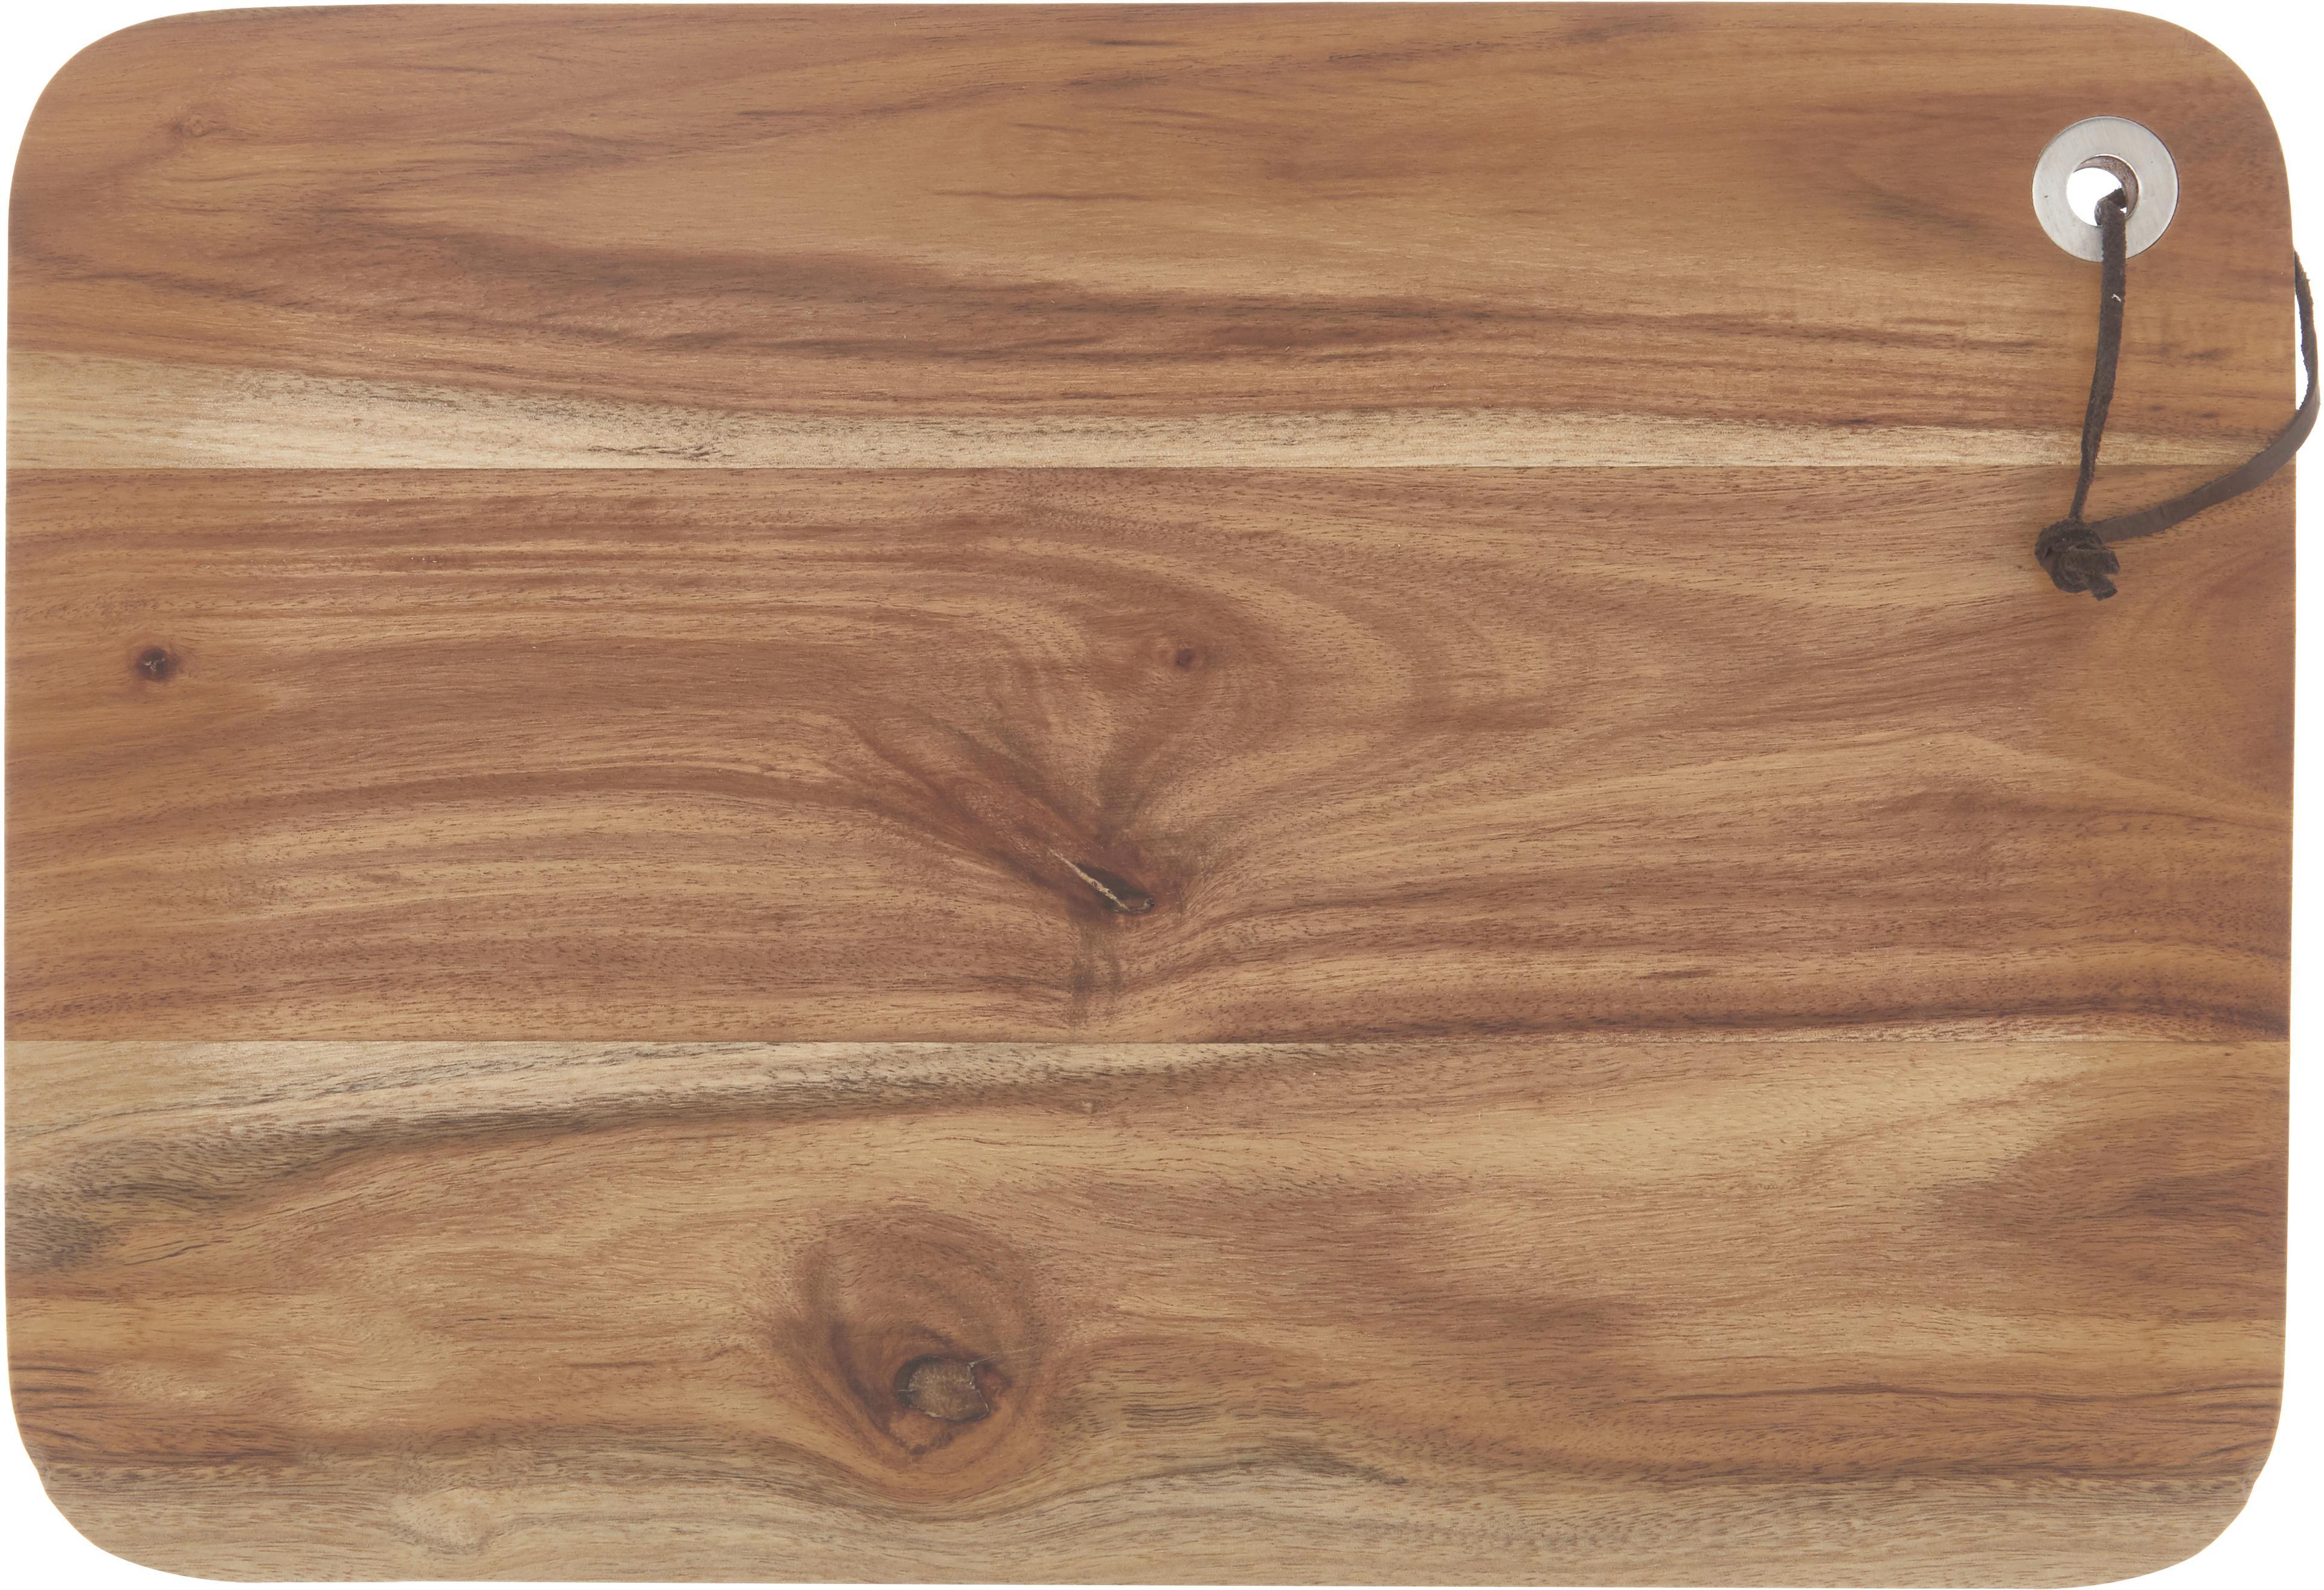 Tagliere Acacia, Legno di acacia, Legno di acacia, Larg. 33 x Prof. 23 cm